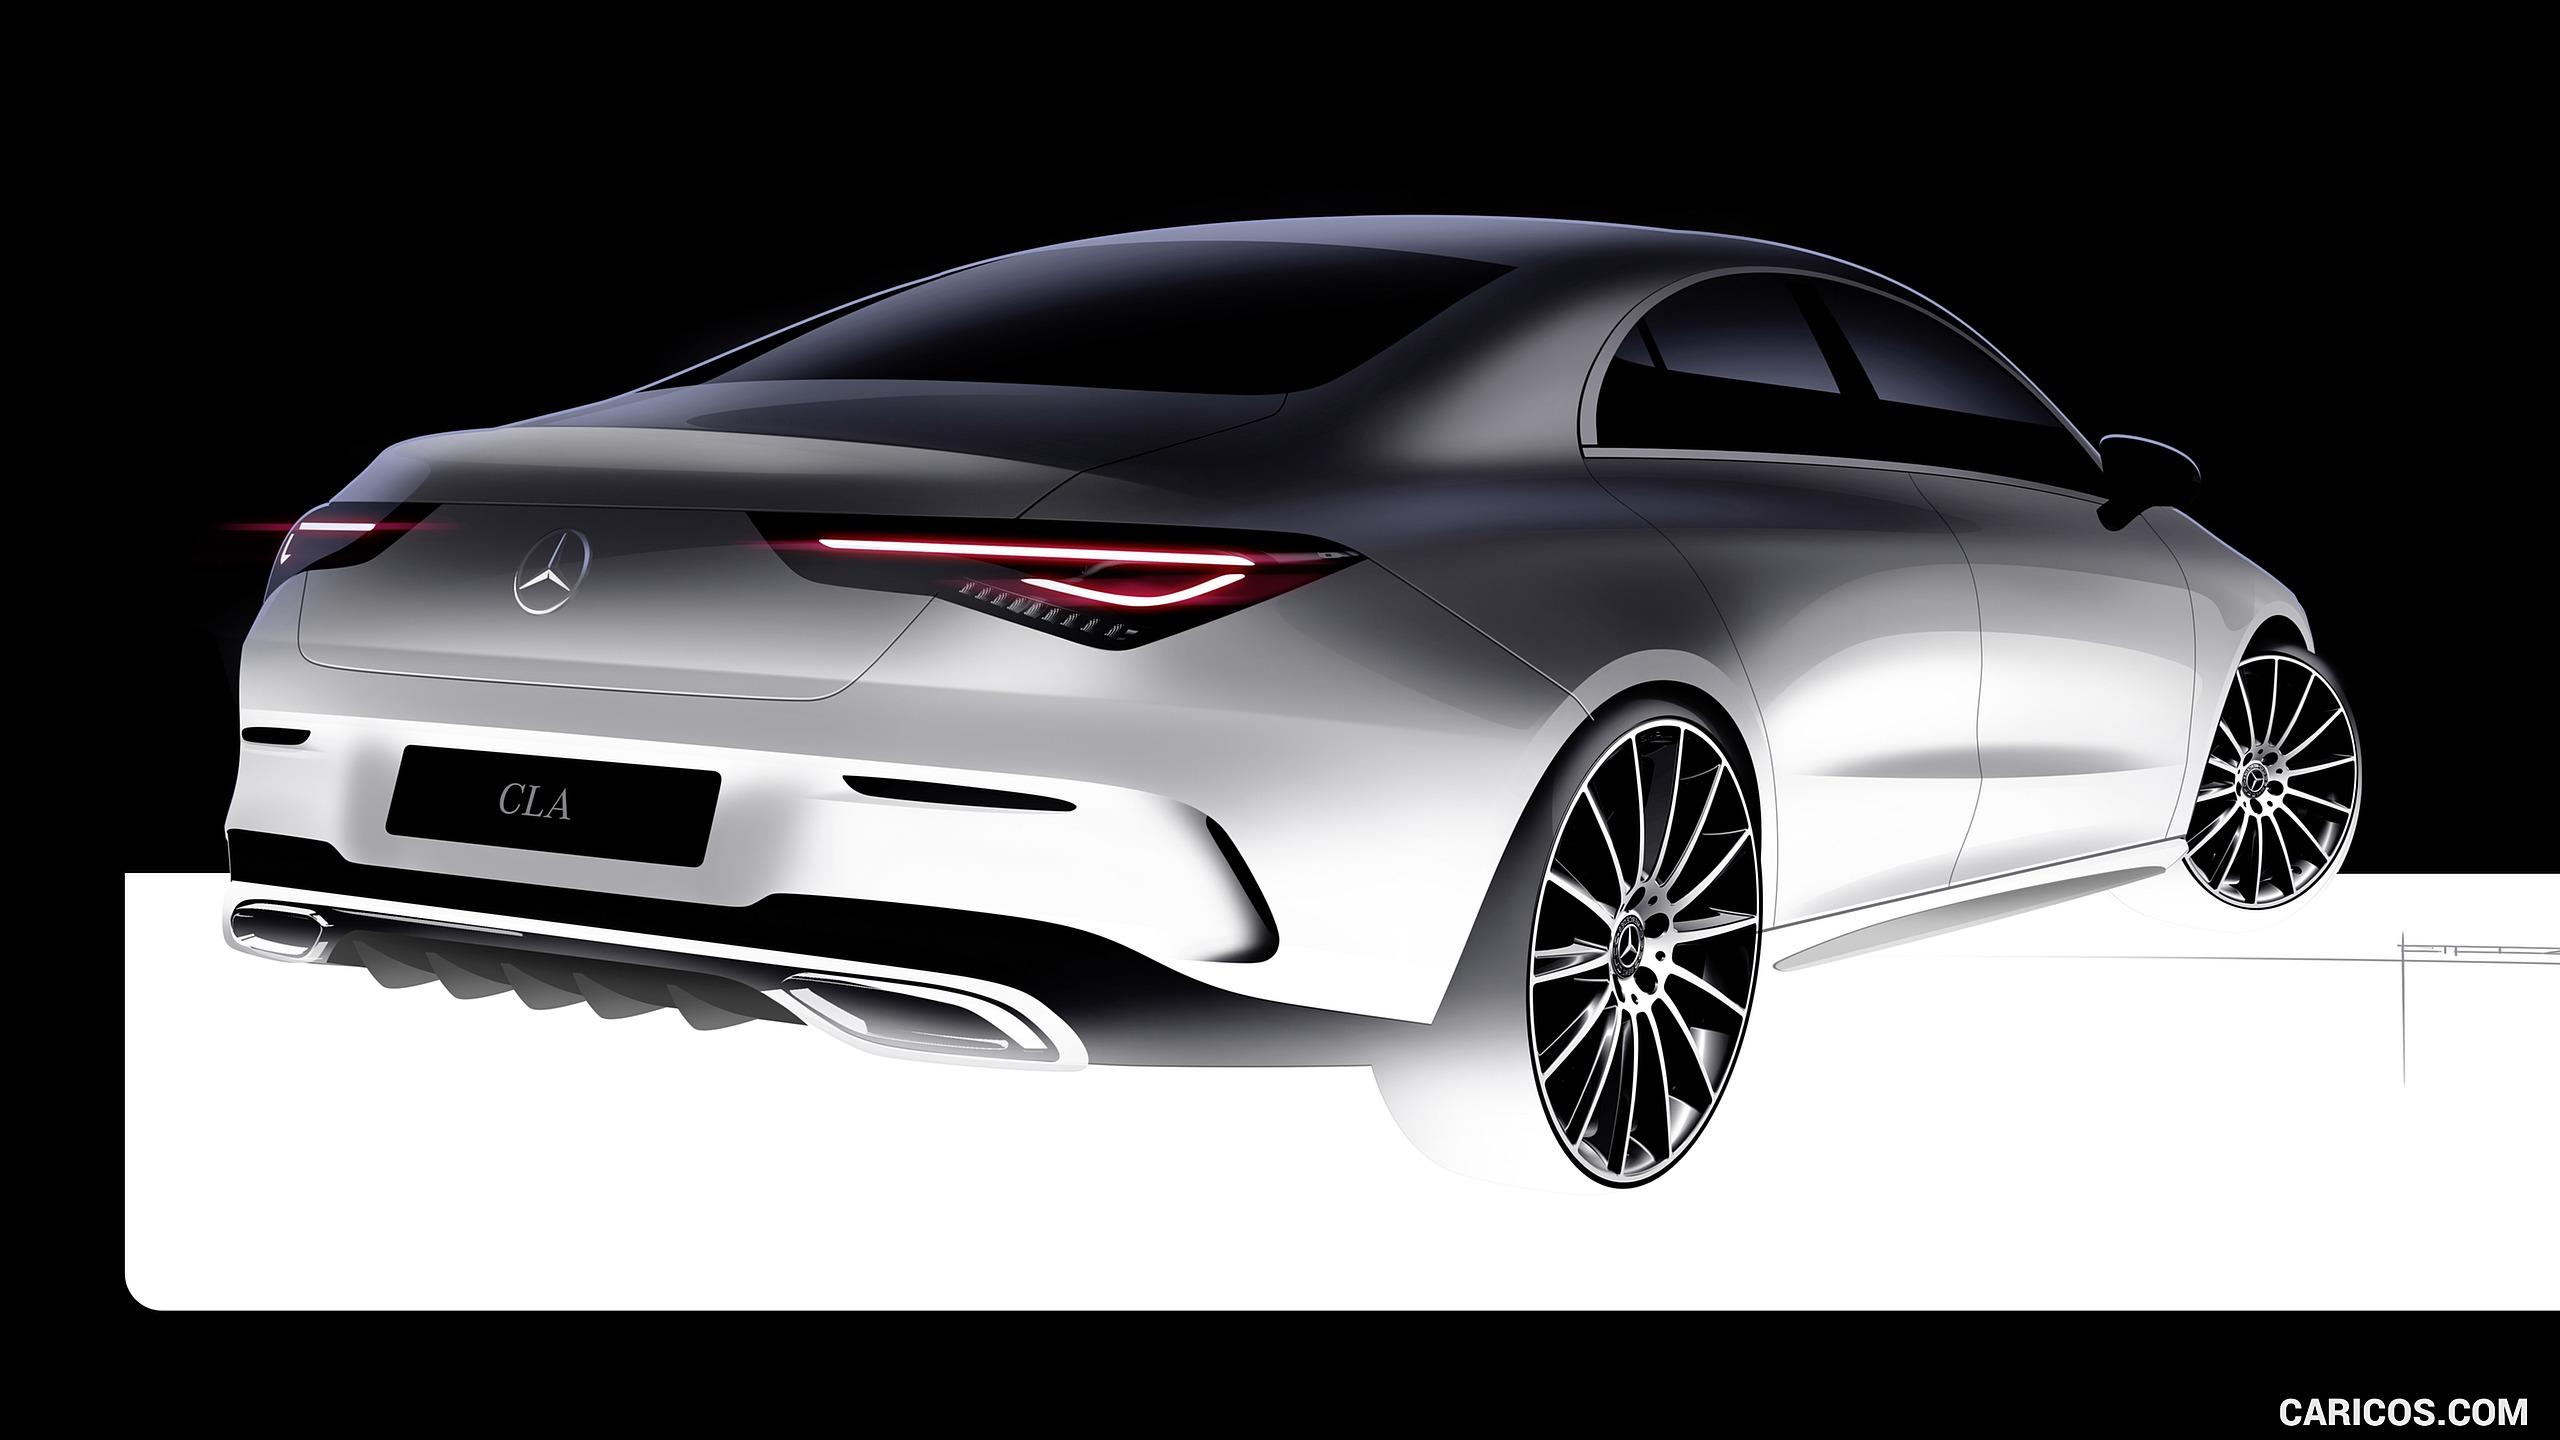 2020 Mercedes Benz CLA 250 Coupe   Design Sketch HD Wallpaper 49 2560x1440